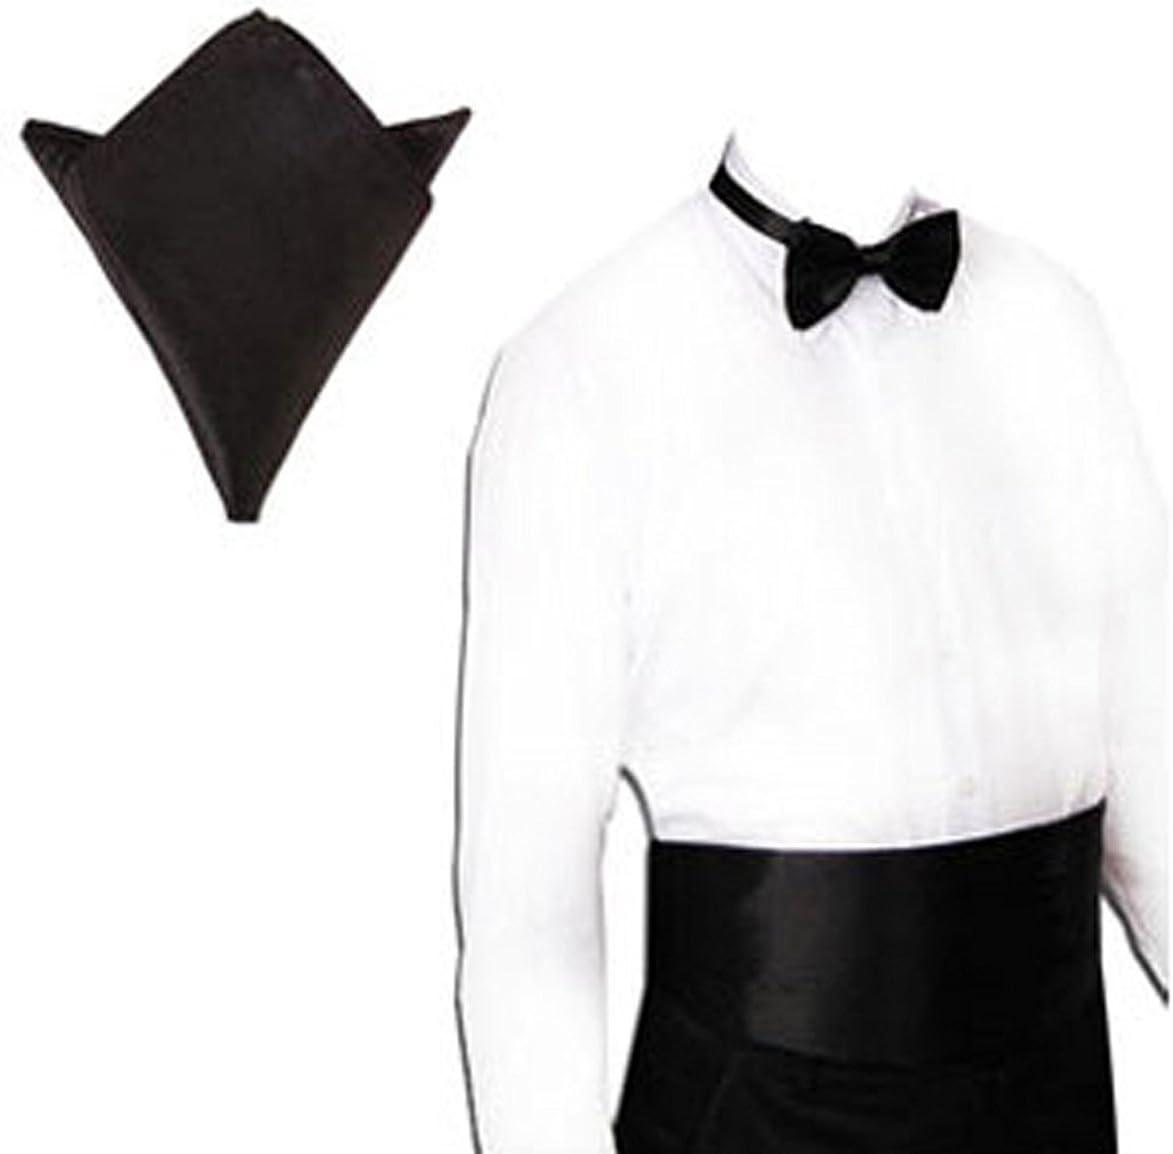 Bow Tie and Hanky Handkerchief 3-Piece Set Black Rosenice Mens Satin Cummerbund